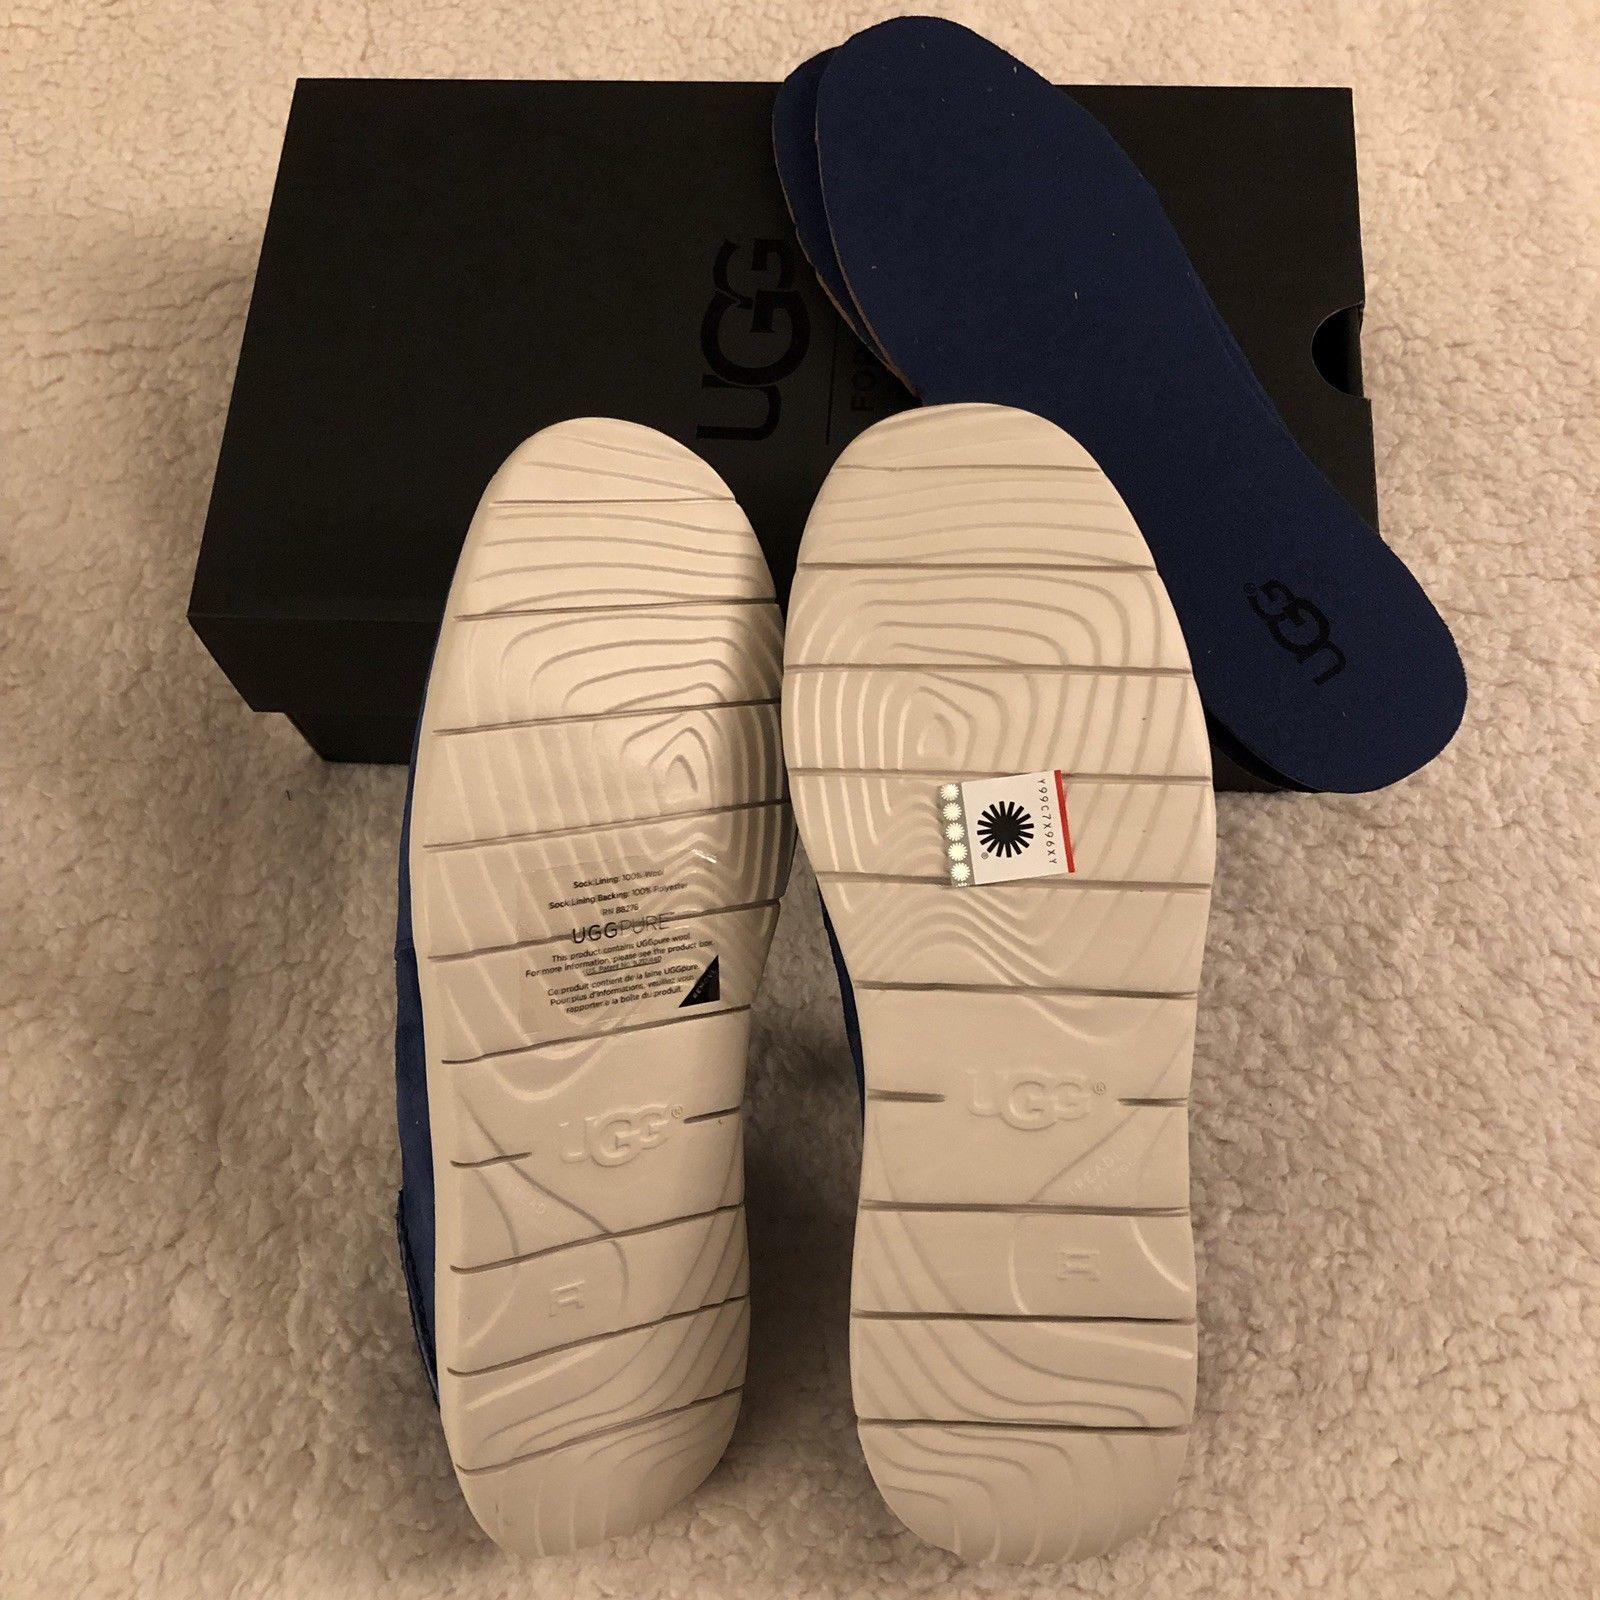 NEW UGG Men's Knox Suede Slip On Sneaker, Sizes 9, 11  Blue, MSRP $100 image 12